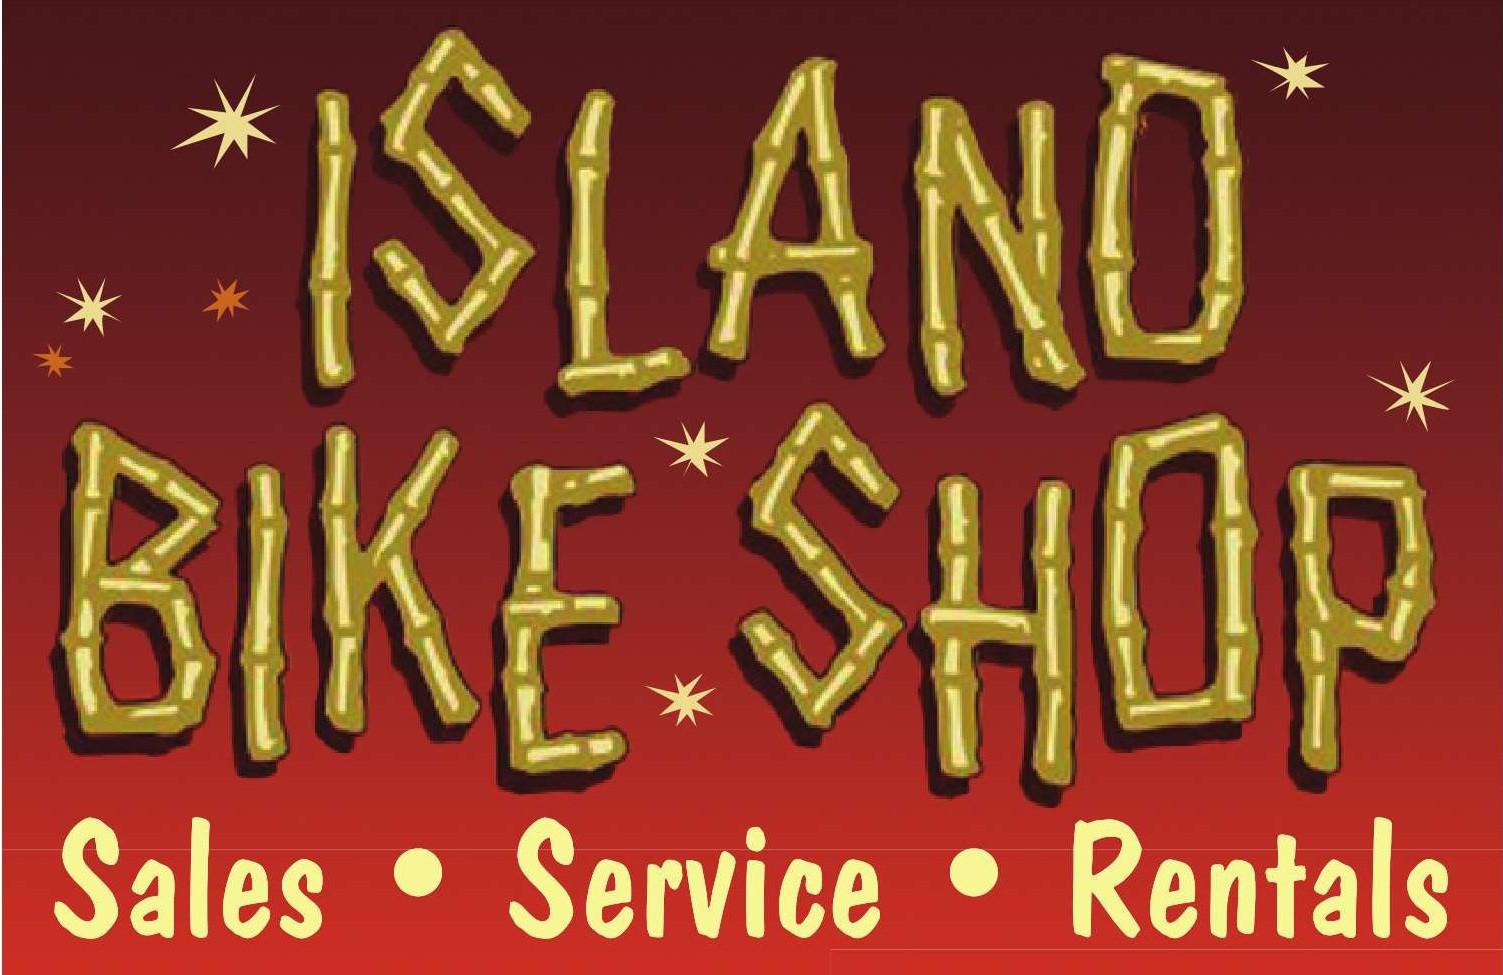 Island Bike Shop